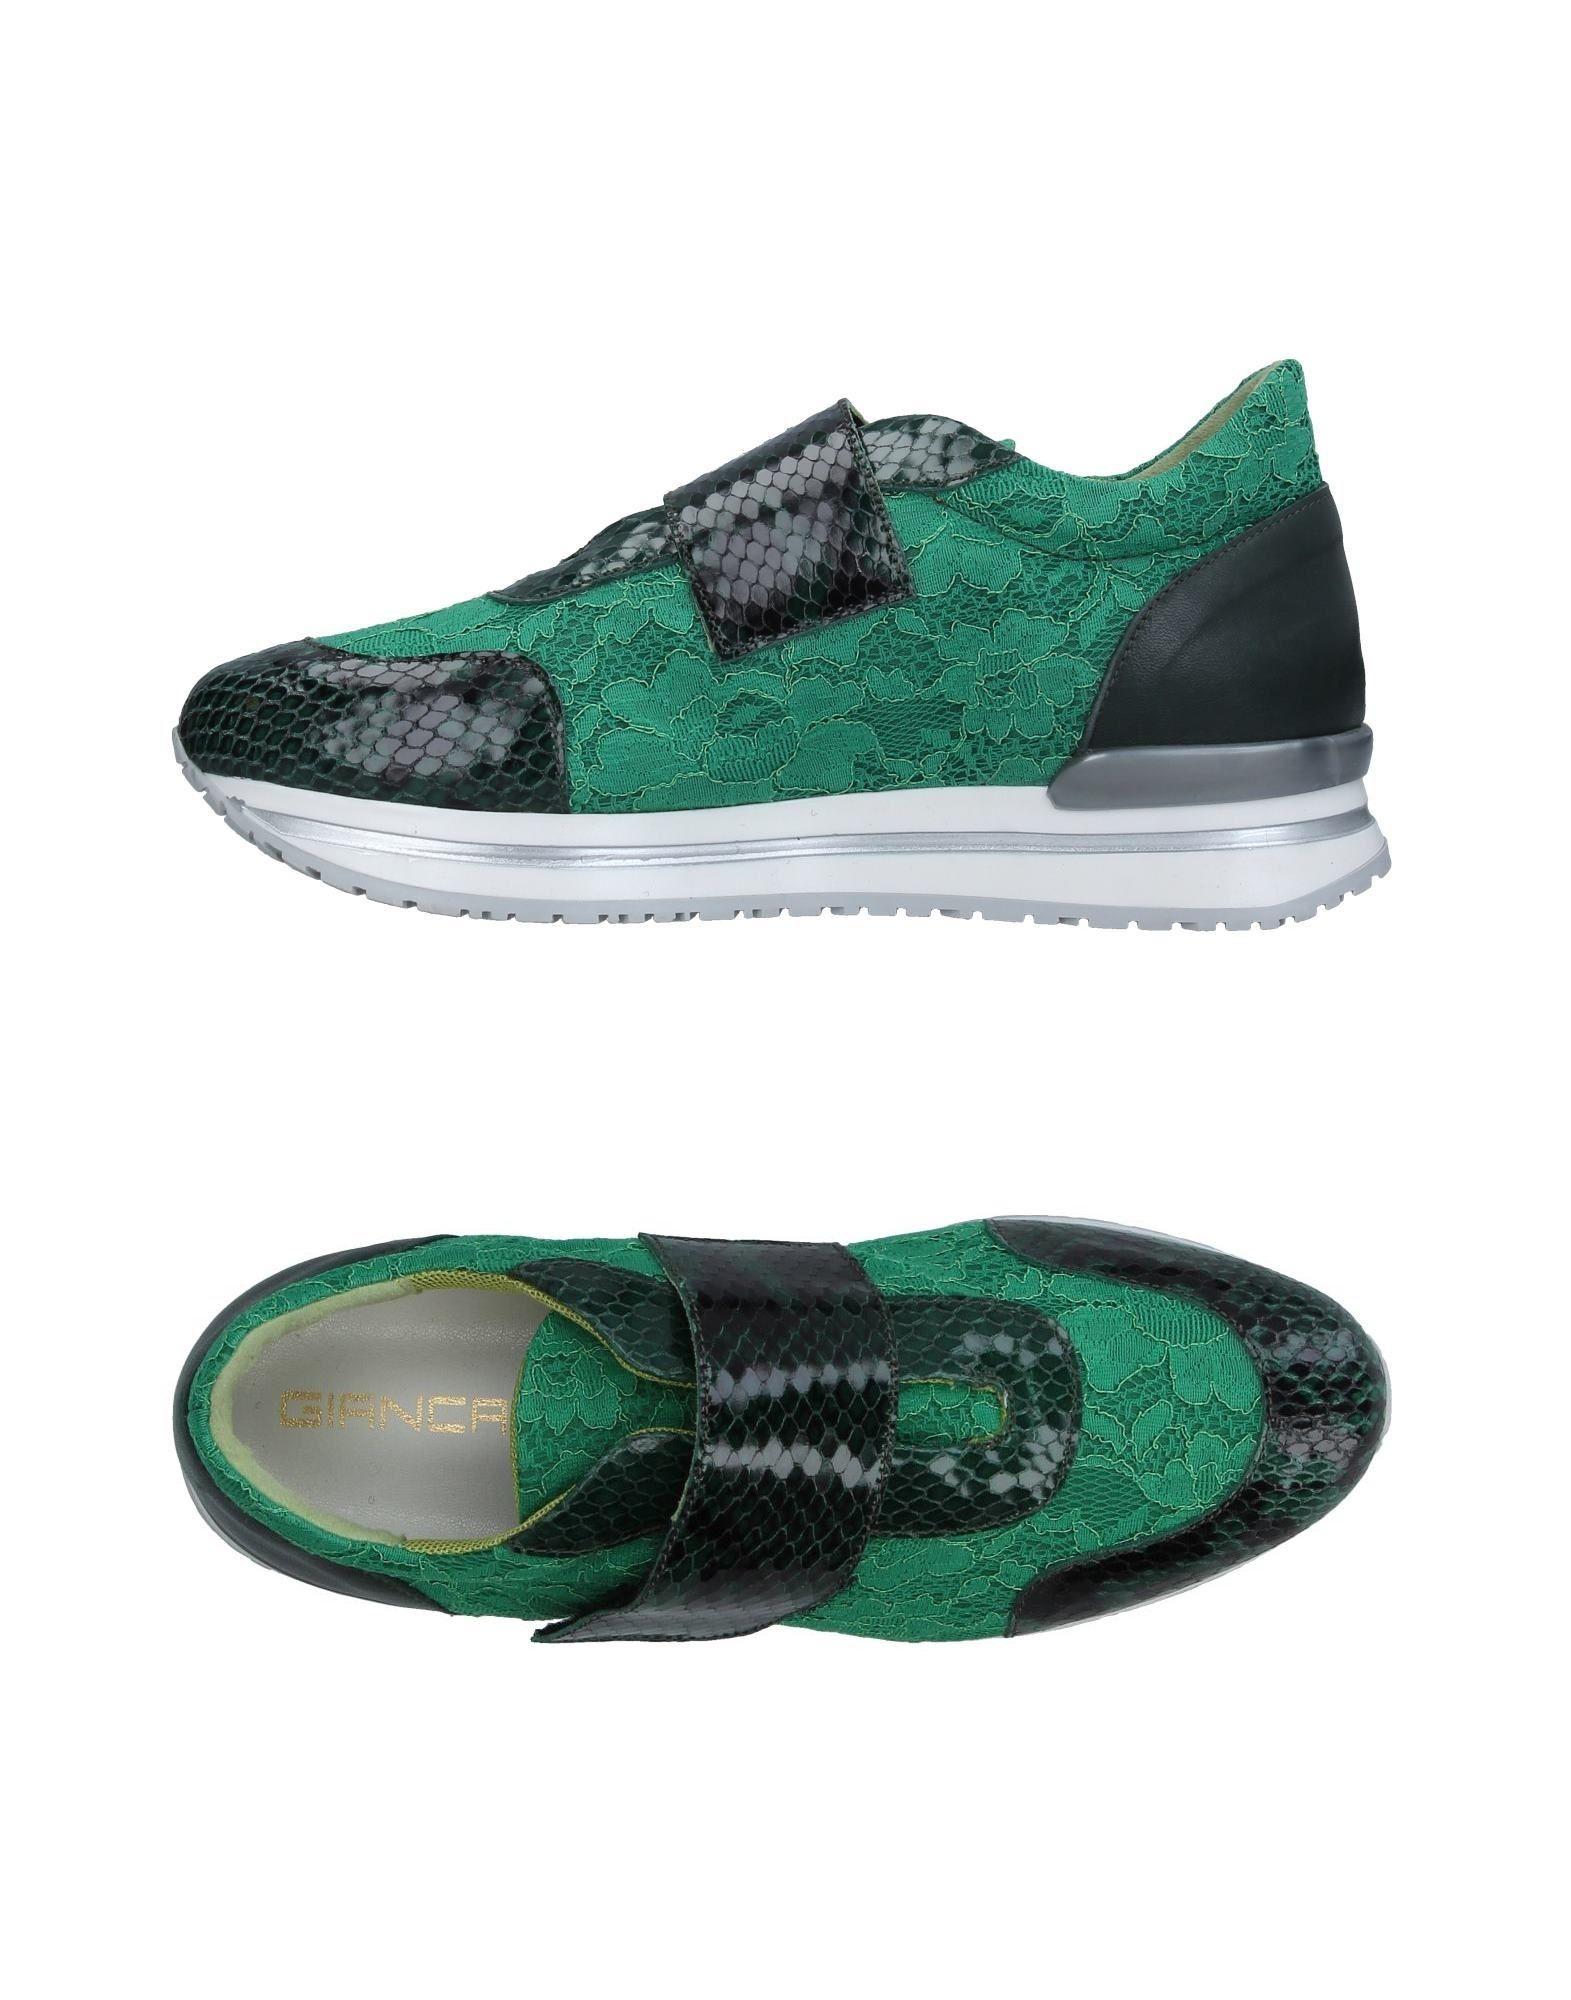 Giancarlo Paoli Sneakers Damen  11343860NL Gute Qualität beliebte Schuhe